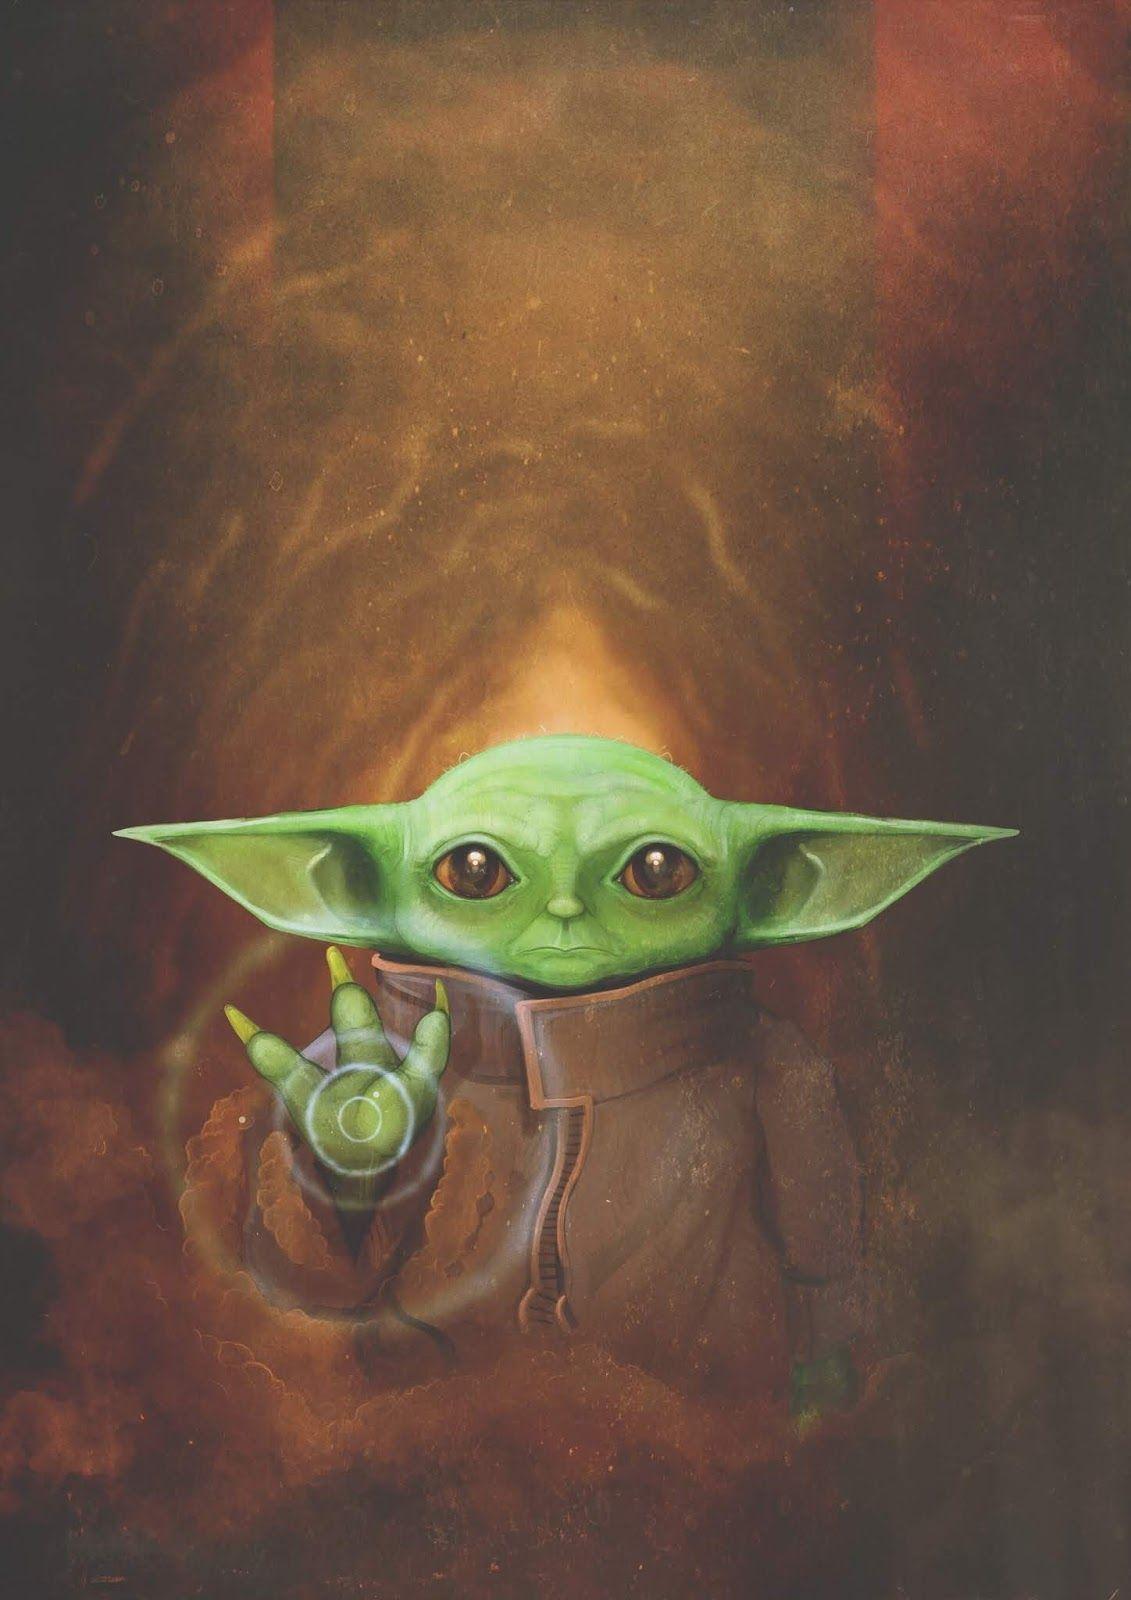 Yoda Cartoon Minimalist Wallpapers - Wallpaper Cave